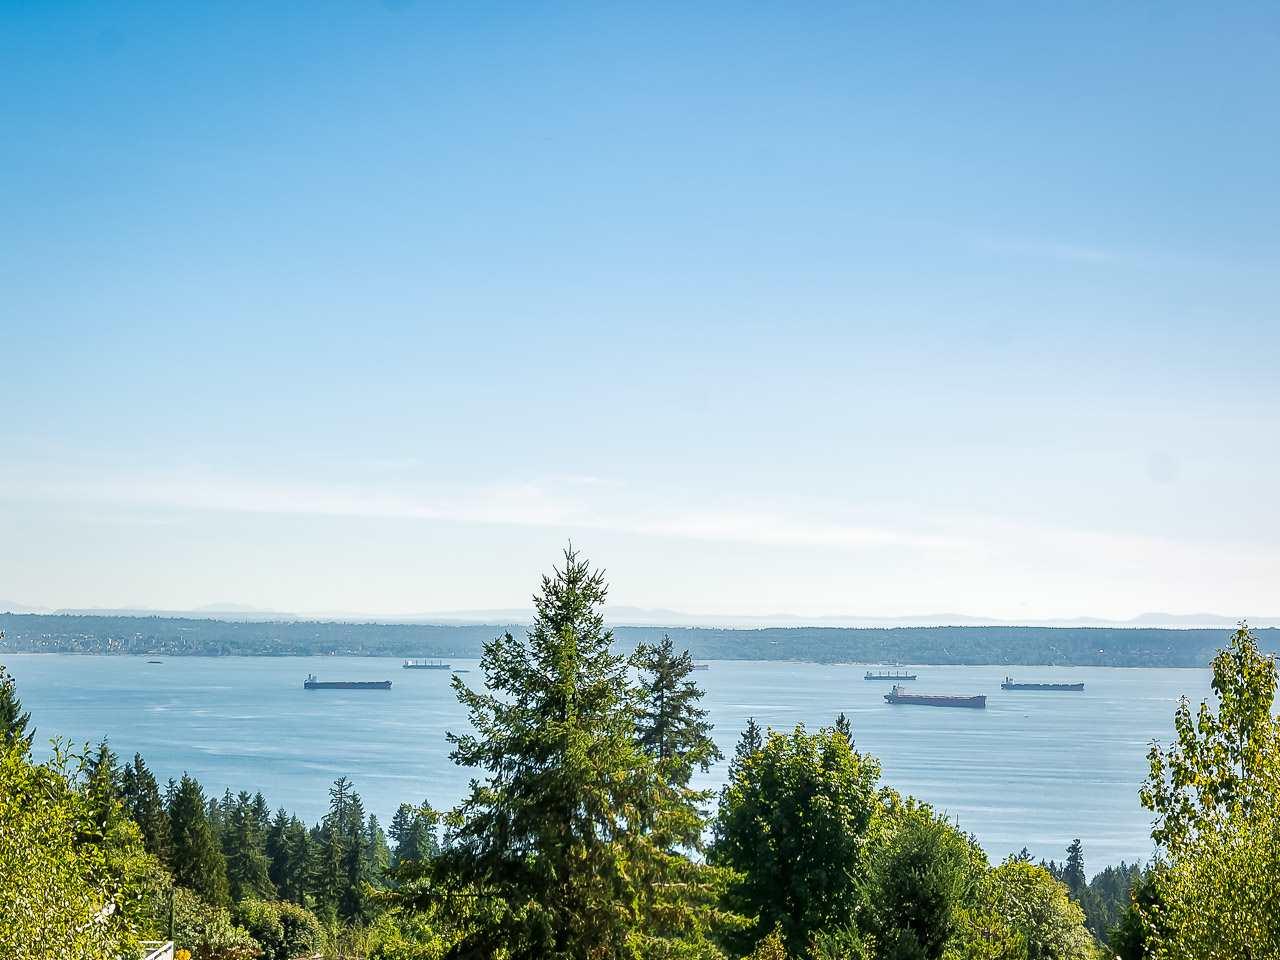 2690 CHELSEA COURT, West Vancouver, BC, V7S 3E9 Photo 1